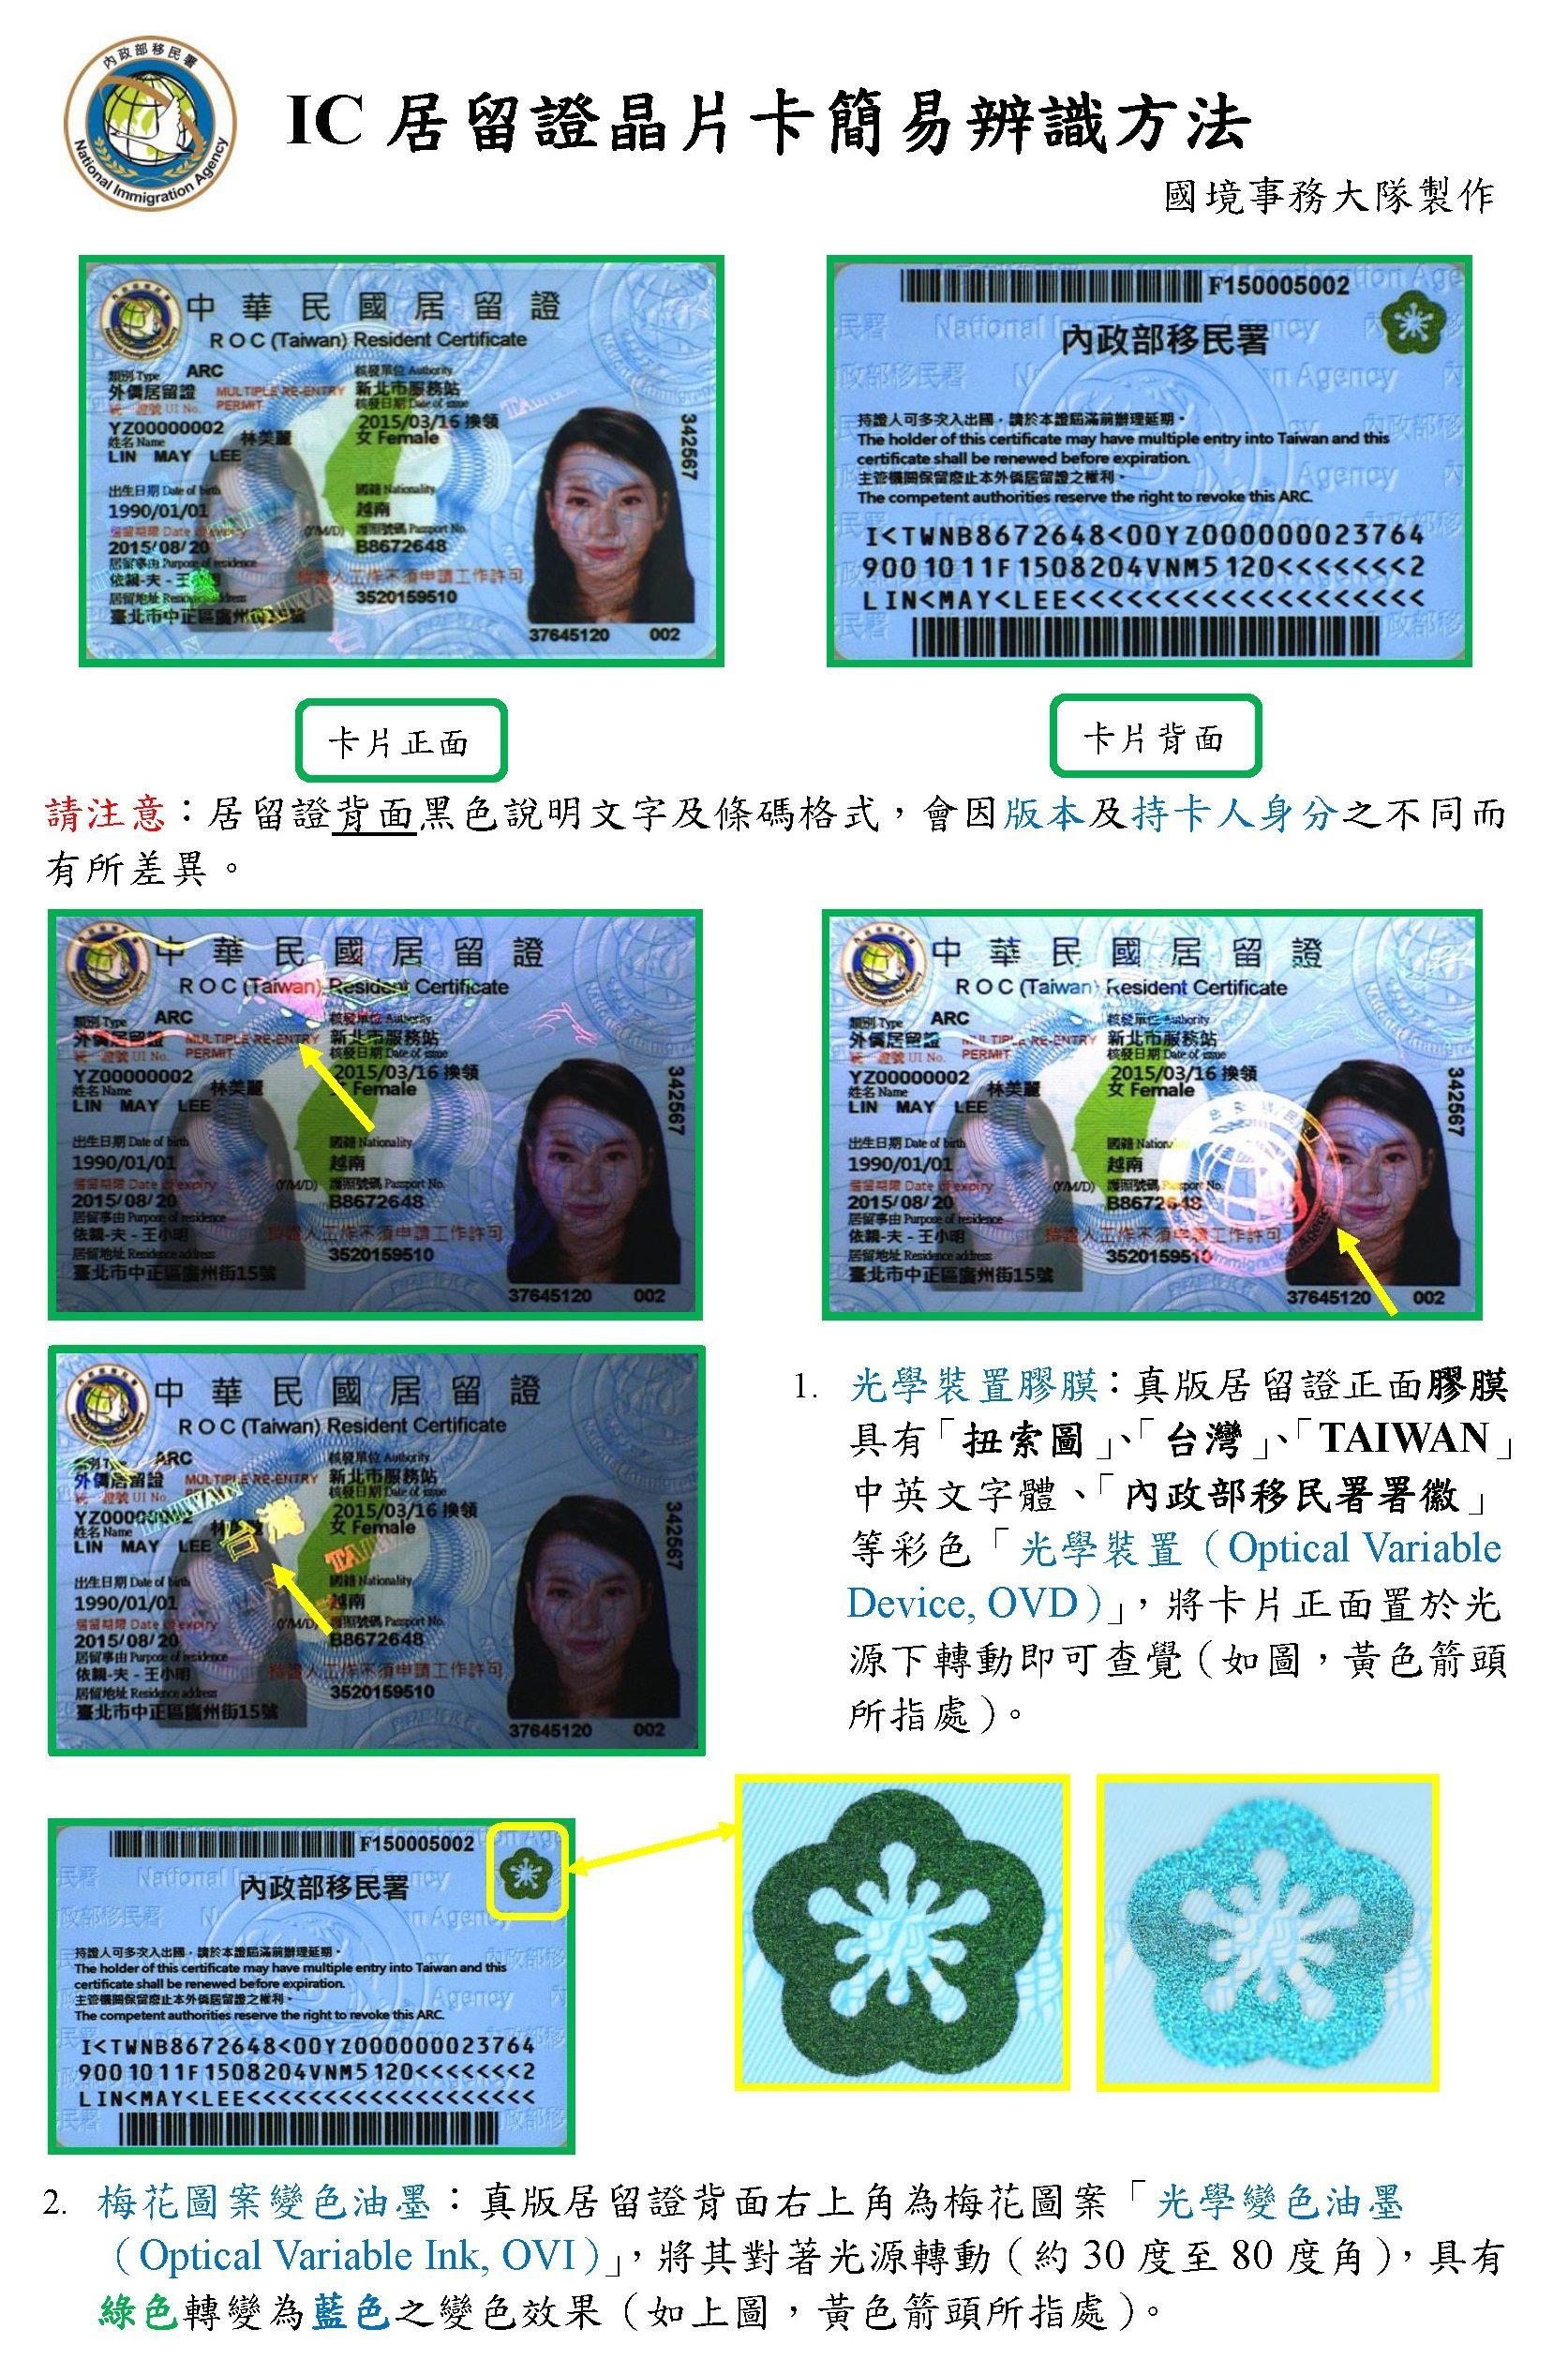 IC居留證晶片卡簡易辨識方法:(請注意居留證背面黑色說明文字及條碼格式。)1、確認居留證是否有光學裝置膠膜,且有「Taiwan」、「台灣」字樣。2、確認居留證梅花圖案油墨,於光源轉動,是否有綠色轉變藍色的效果。